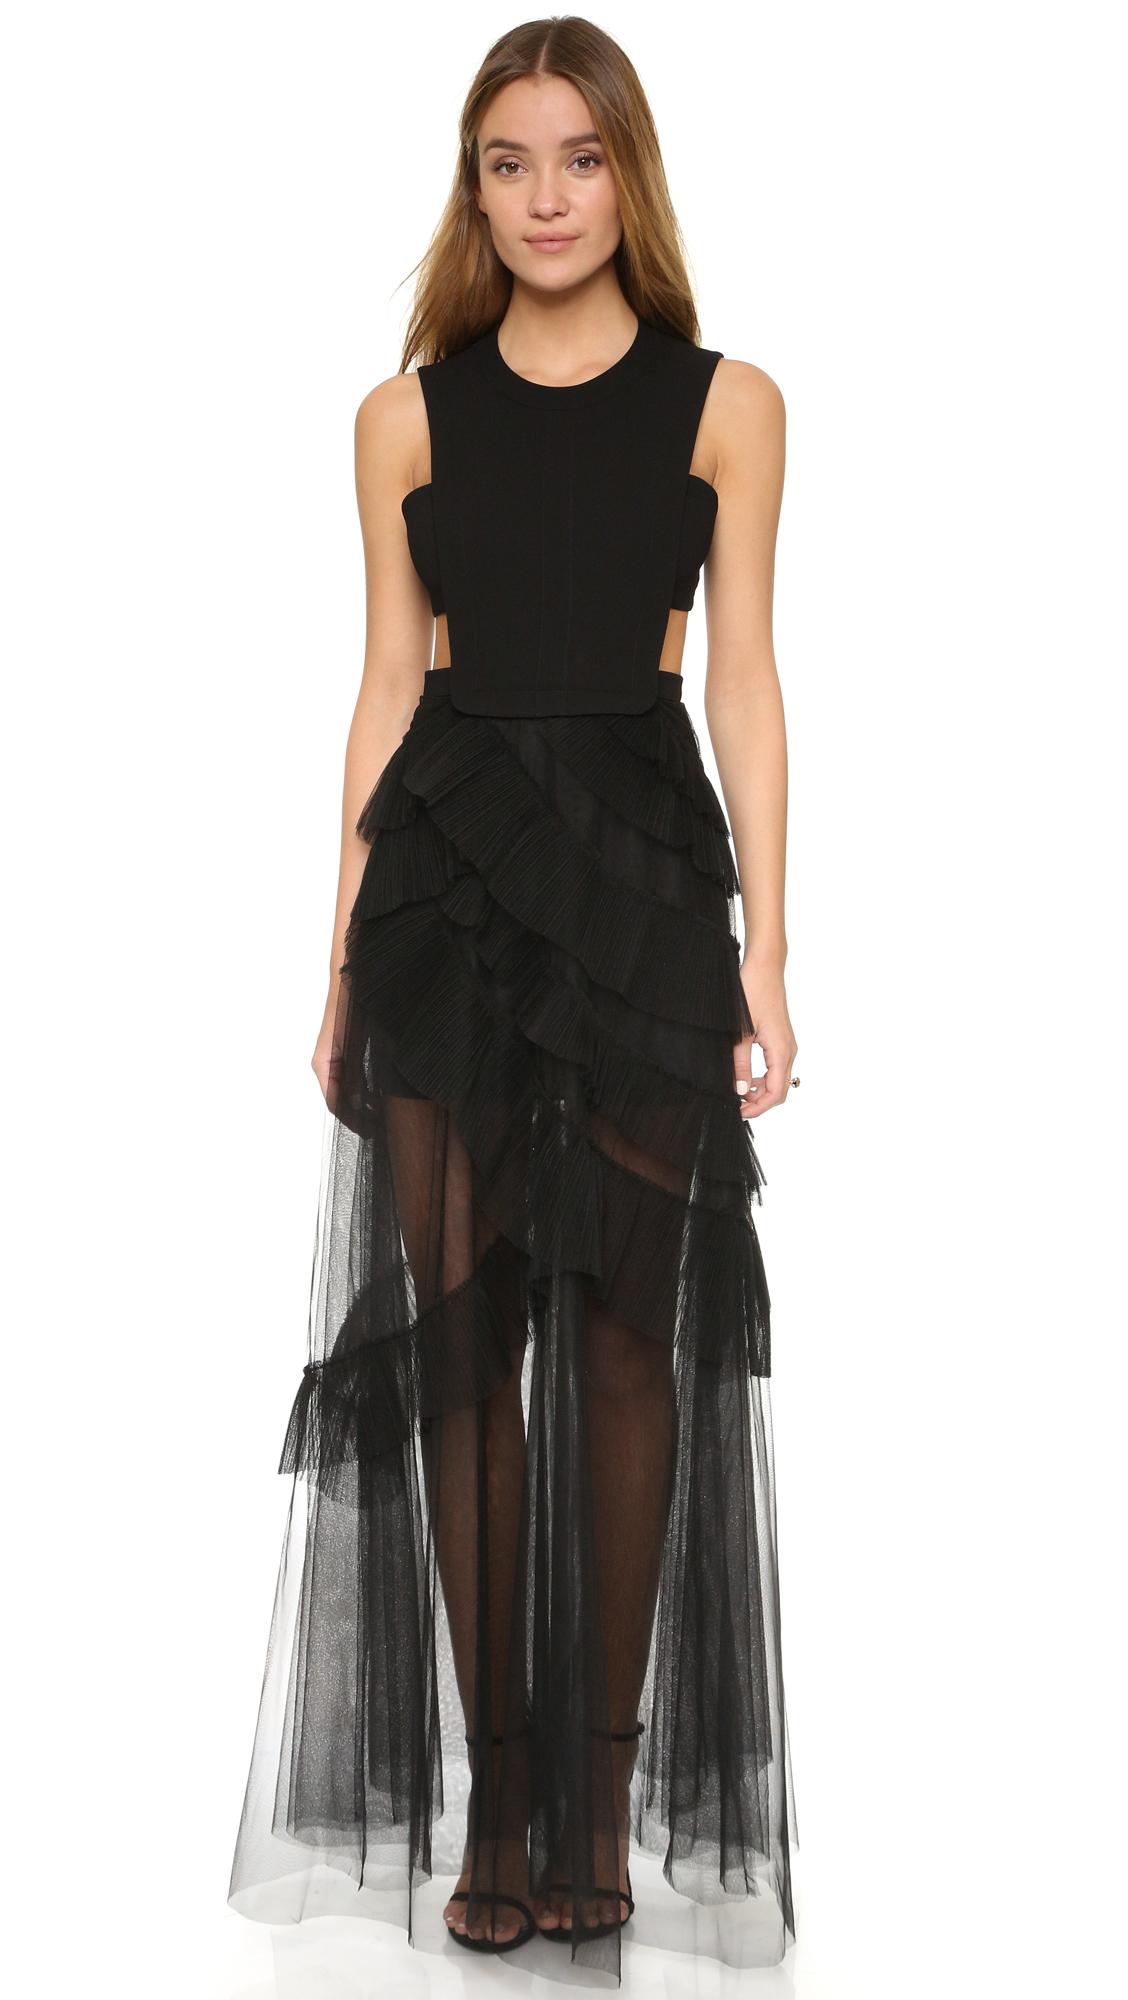 Bcbgmaxazria Tulle Cutout Gown in Black - Lyst